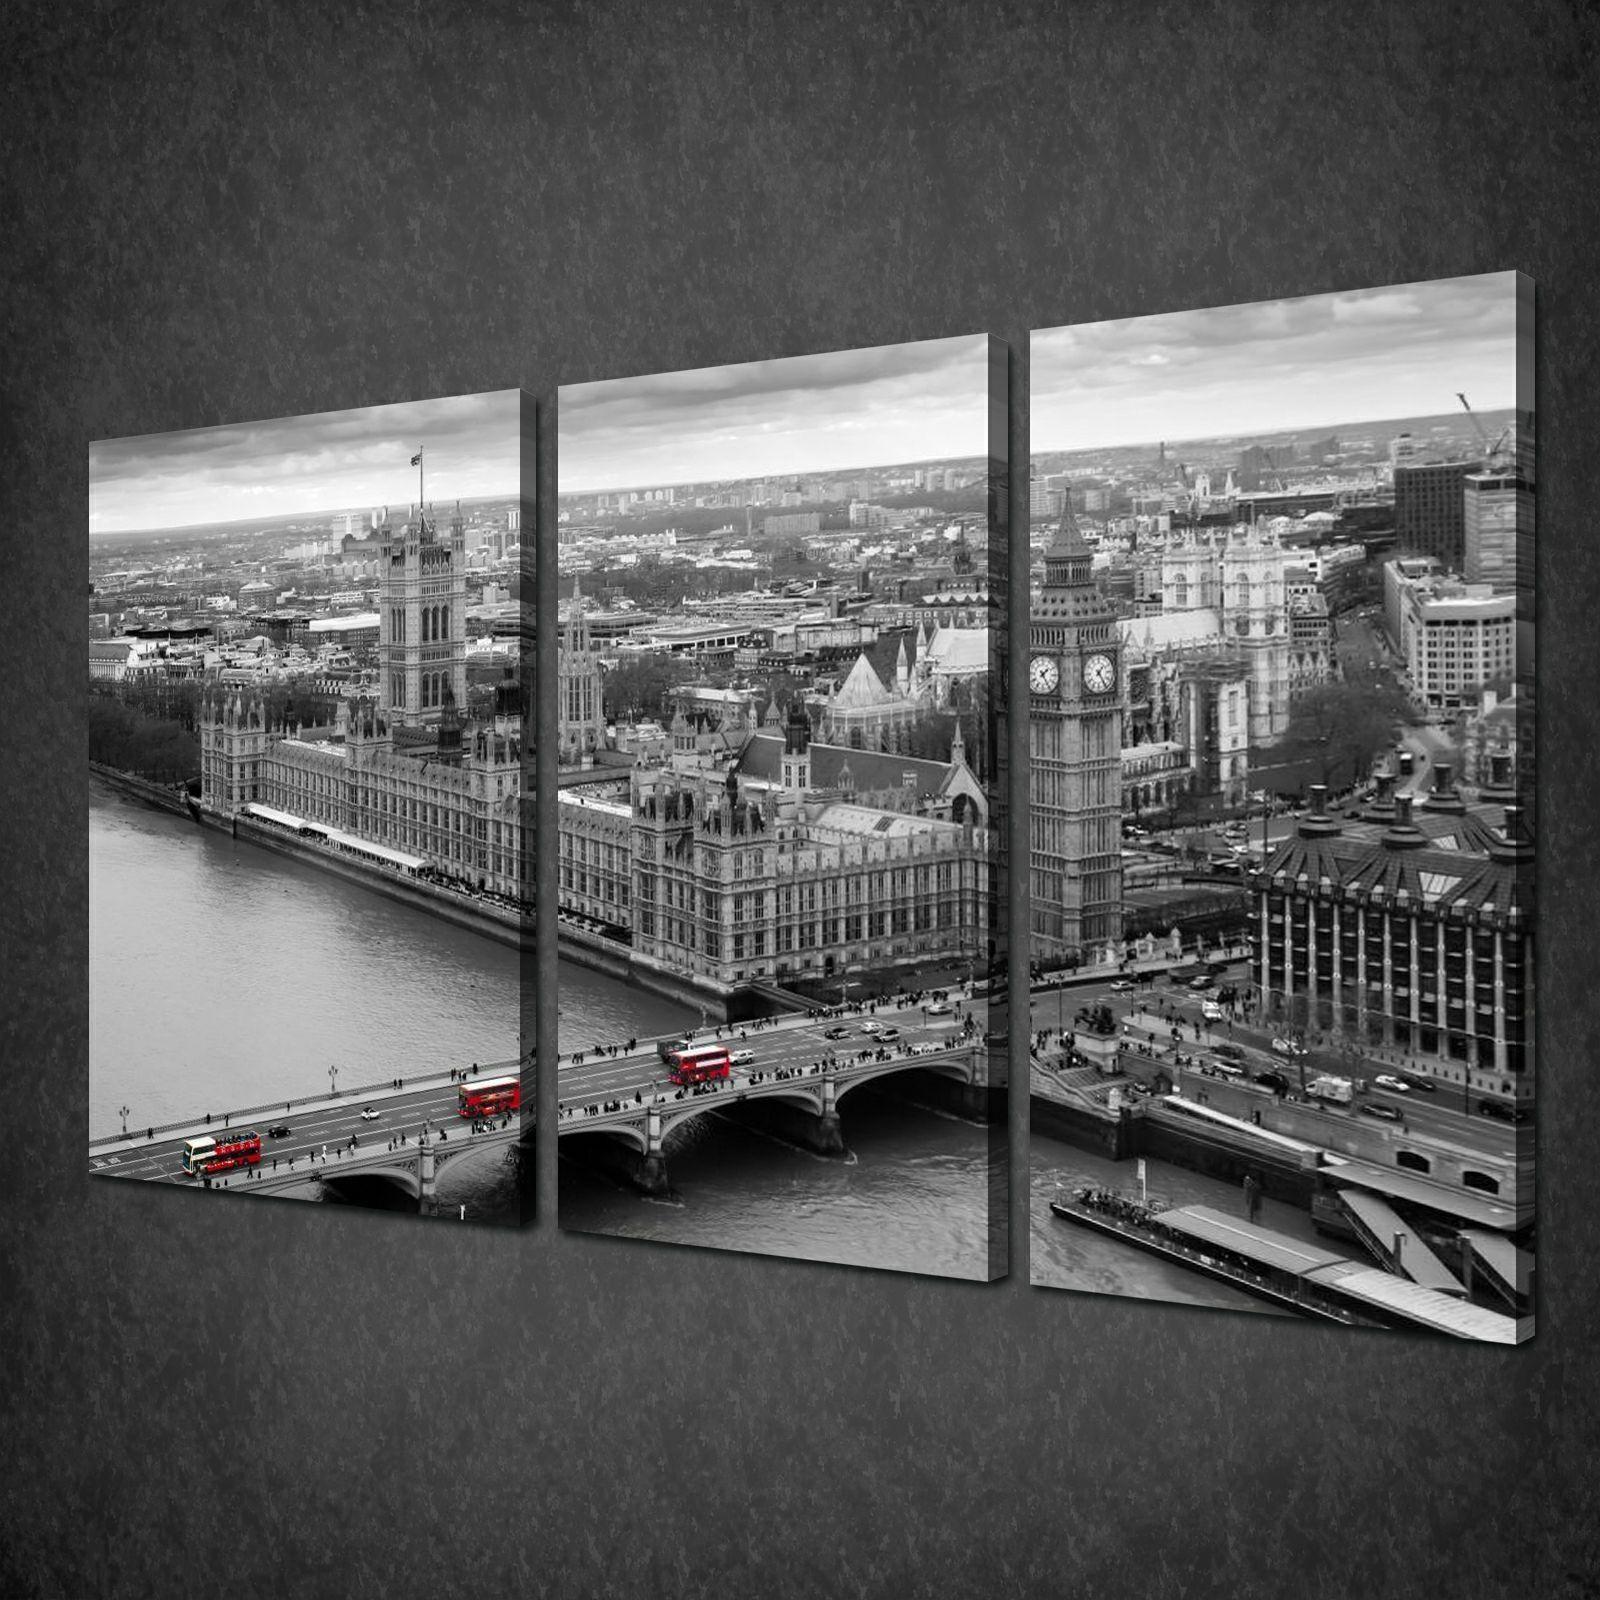 London Wall Art light in london city skyline cascade canvas print picture wall art